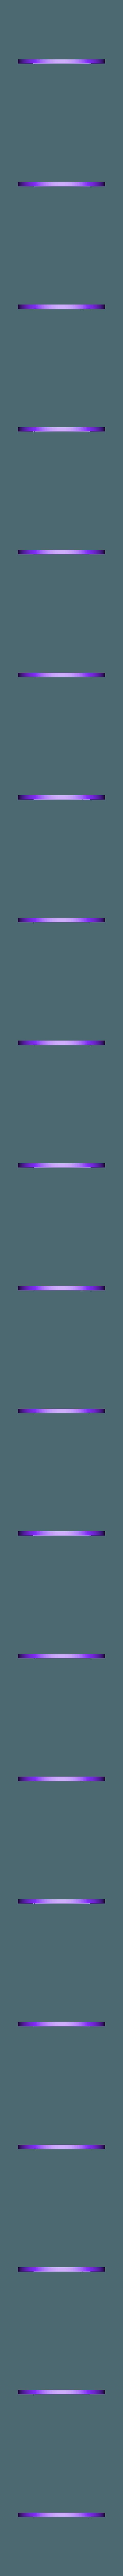 Miami_black.STL Download free STL file Minimal Multi-color NBA coasters • 3D print object, MosaicManufacturing